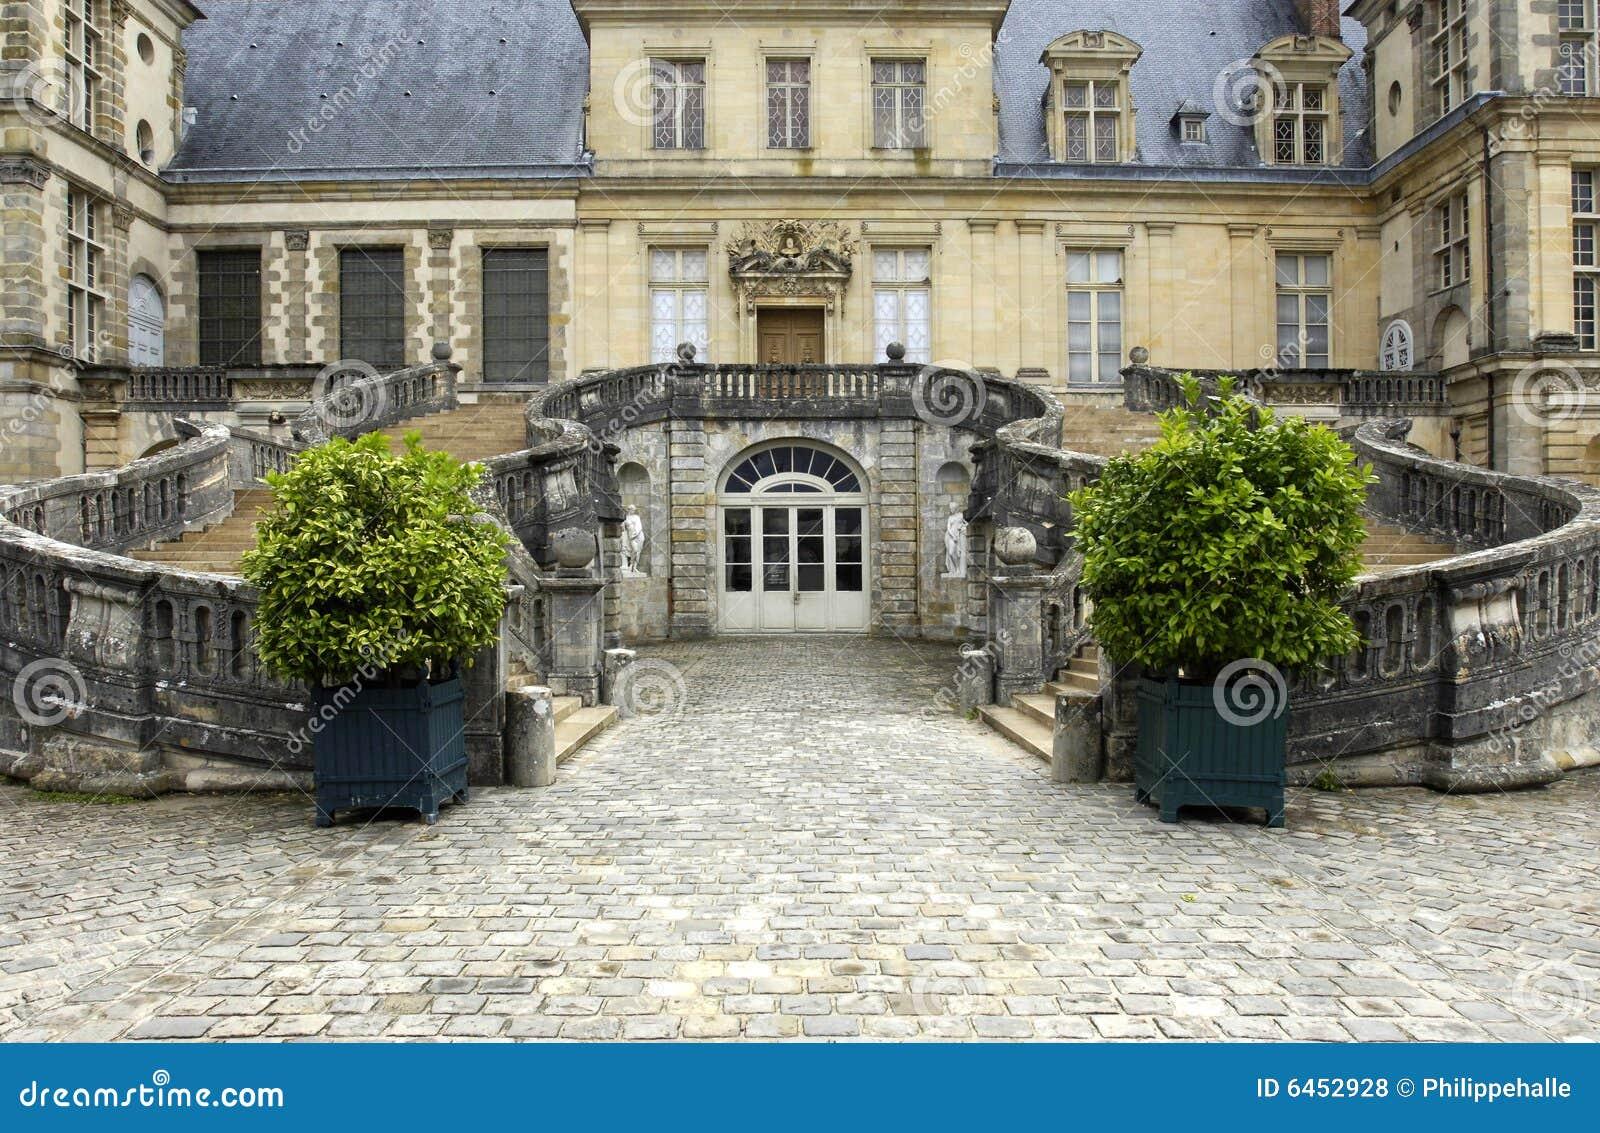 France, Fontainebleau palace